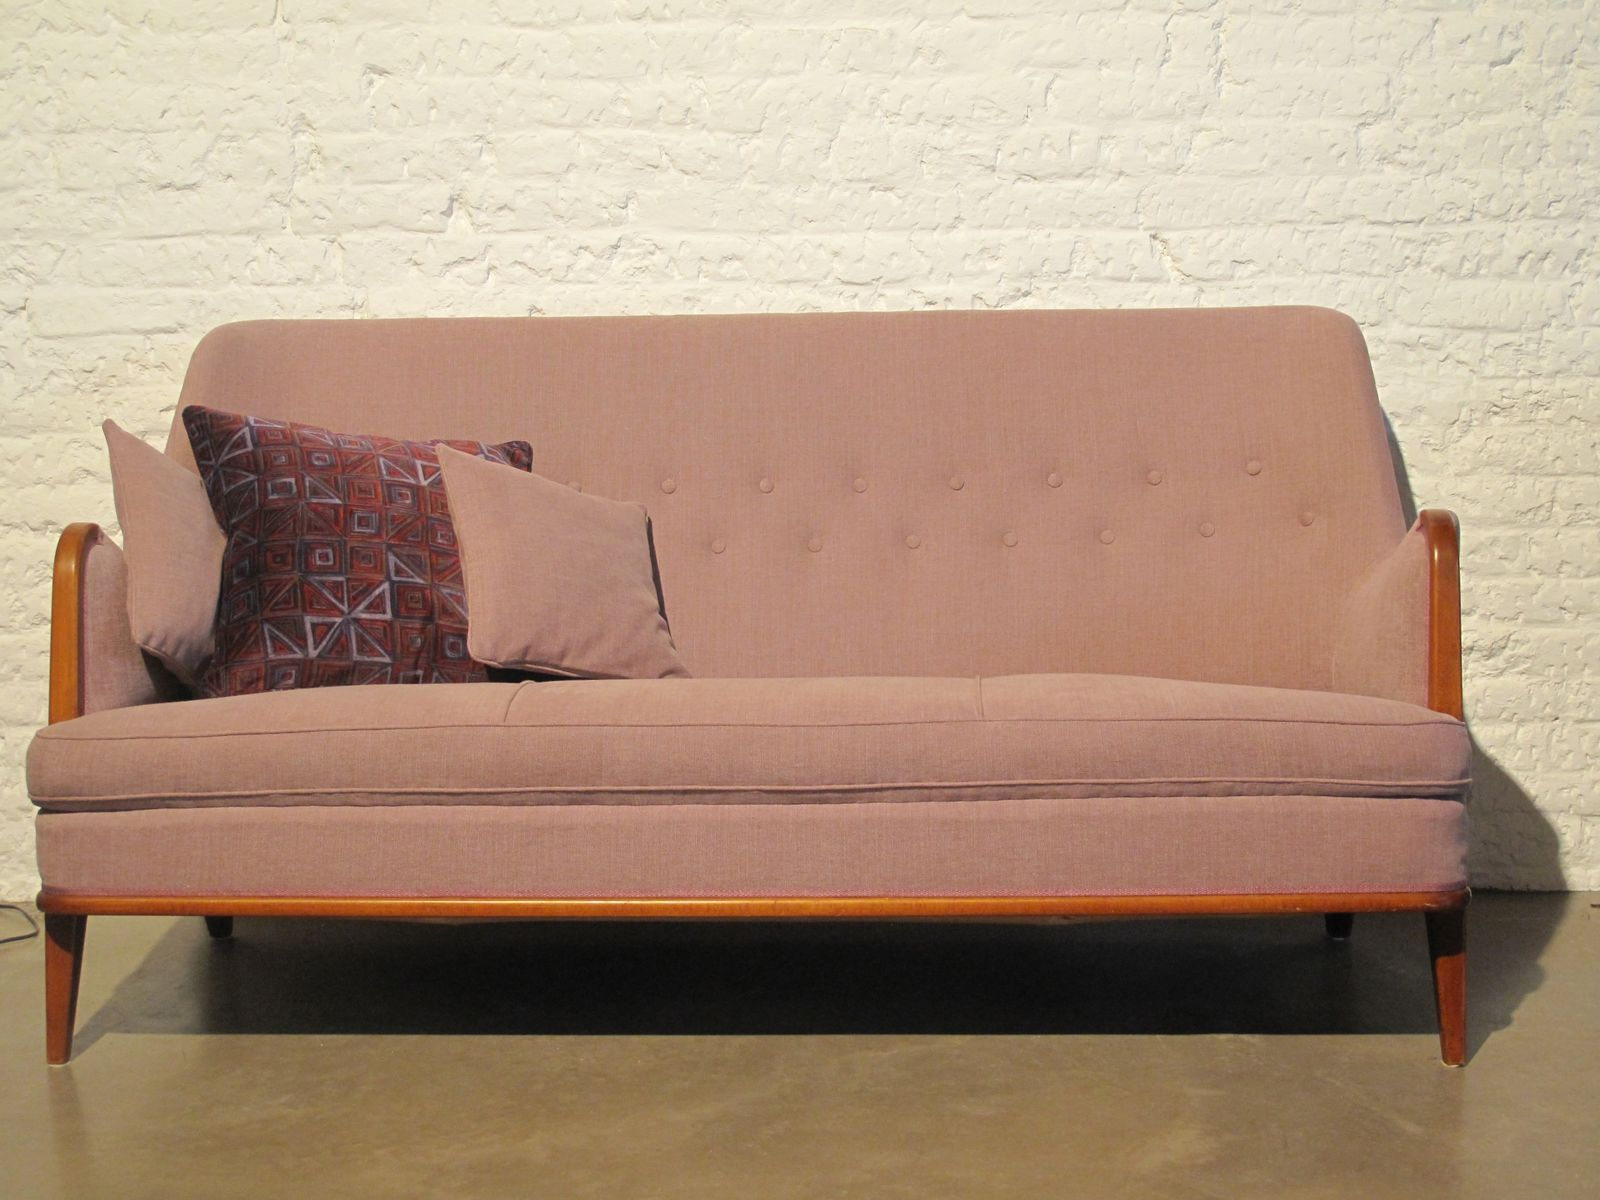 Swedish sofa by carl malmsten 1950s for sale at pamono for Swedish sofa